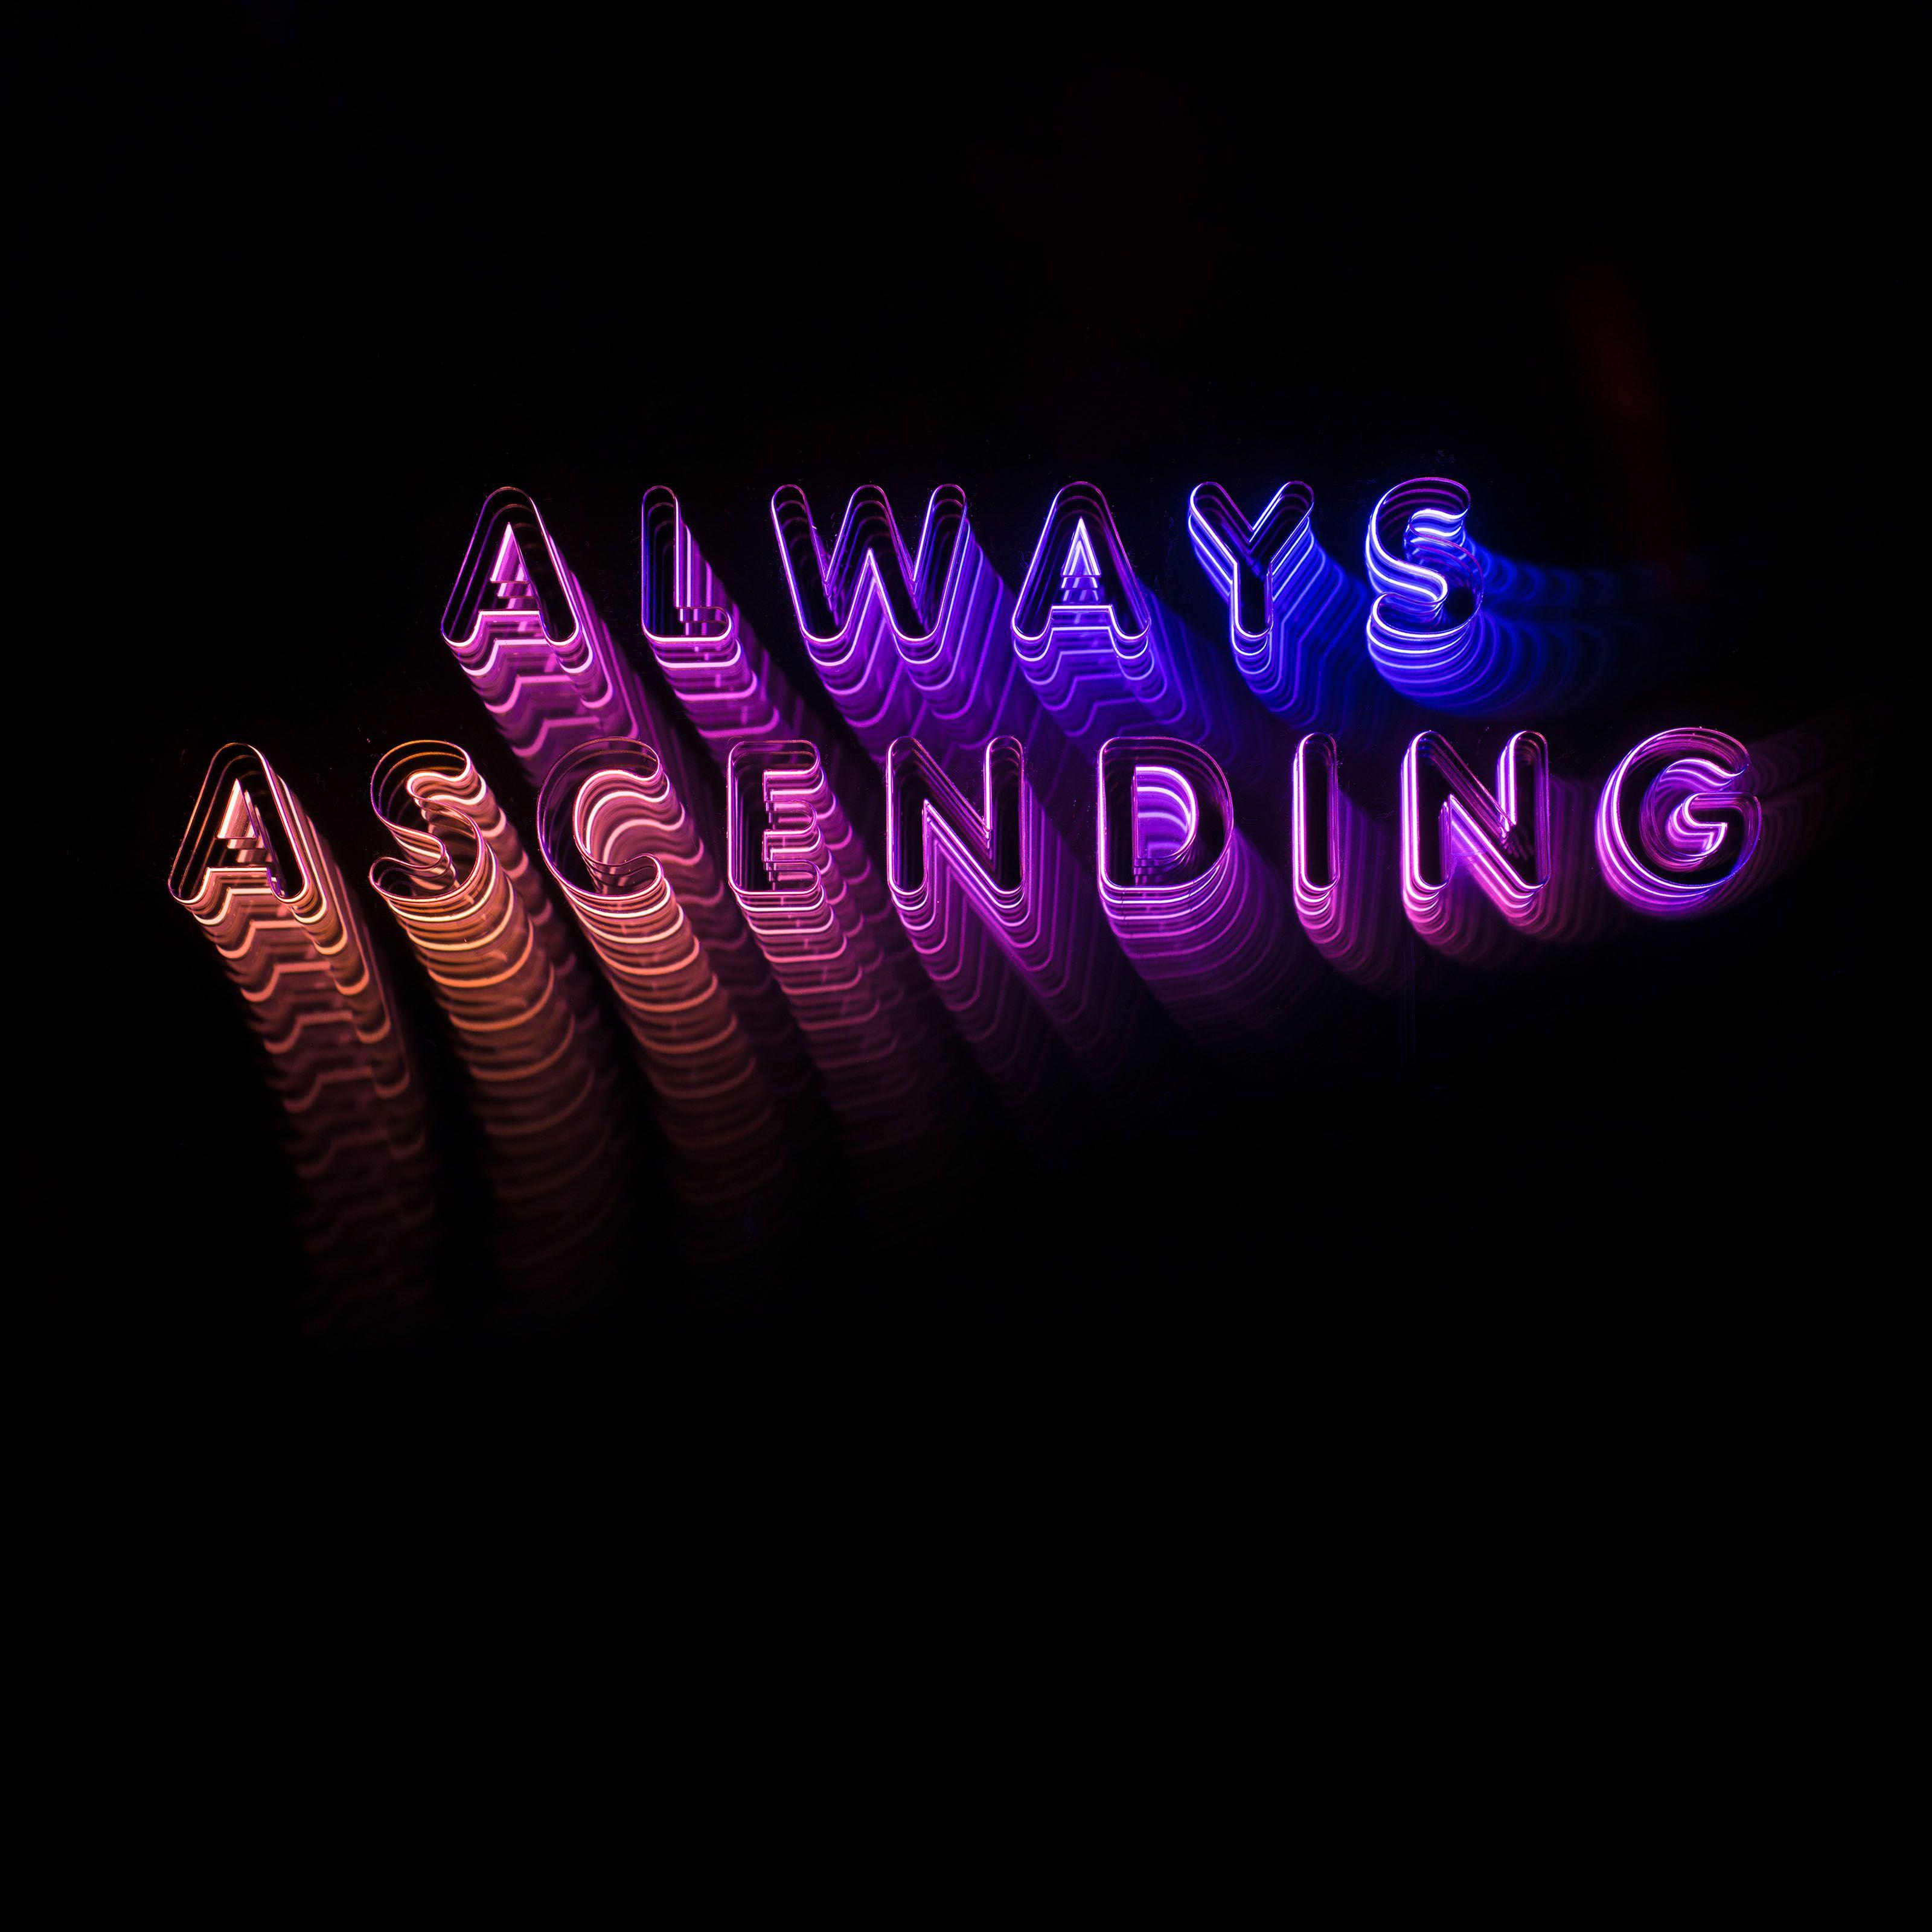 Franz Ferdinand - Always Ascending album cover